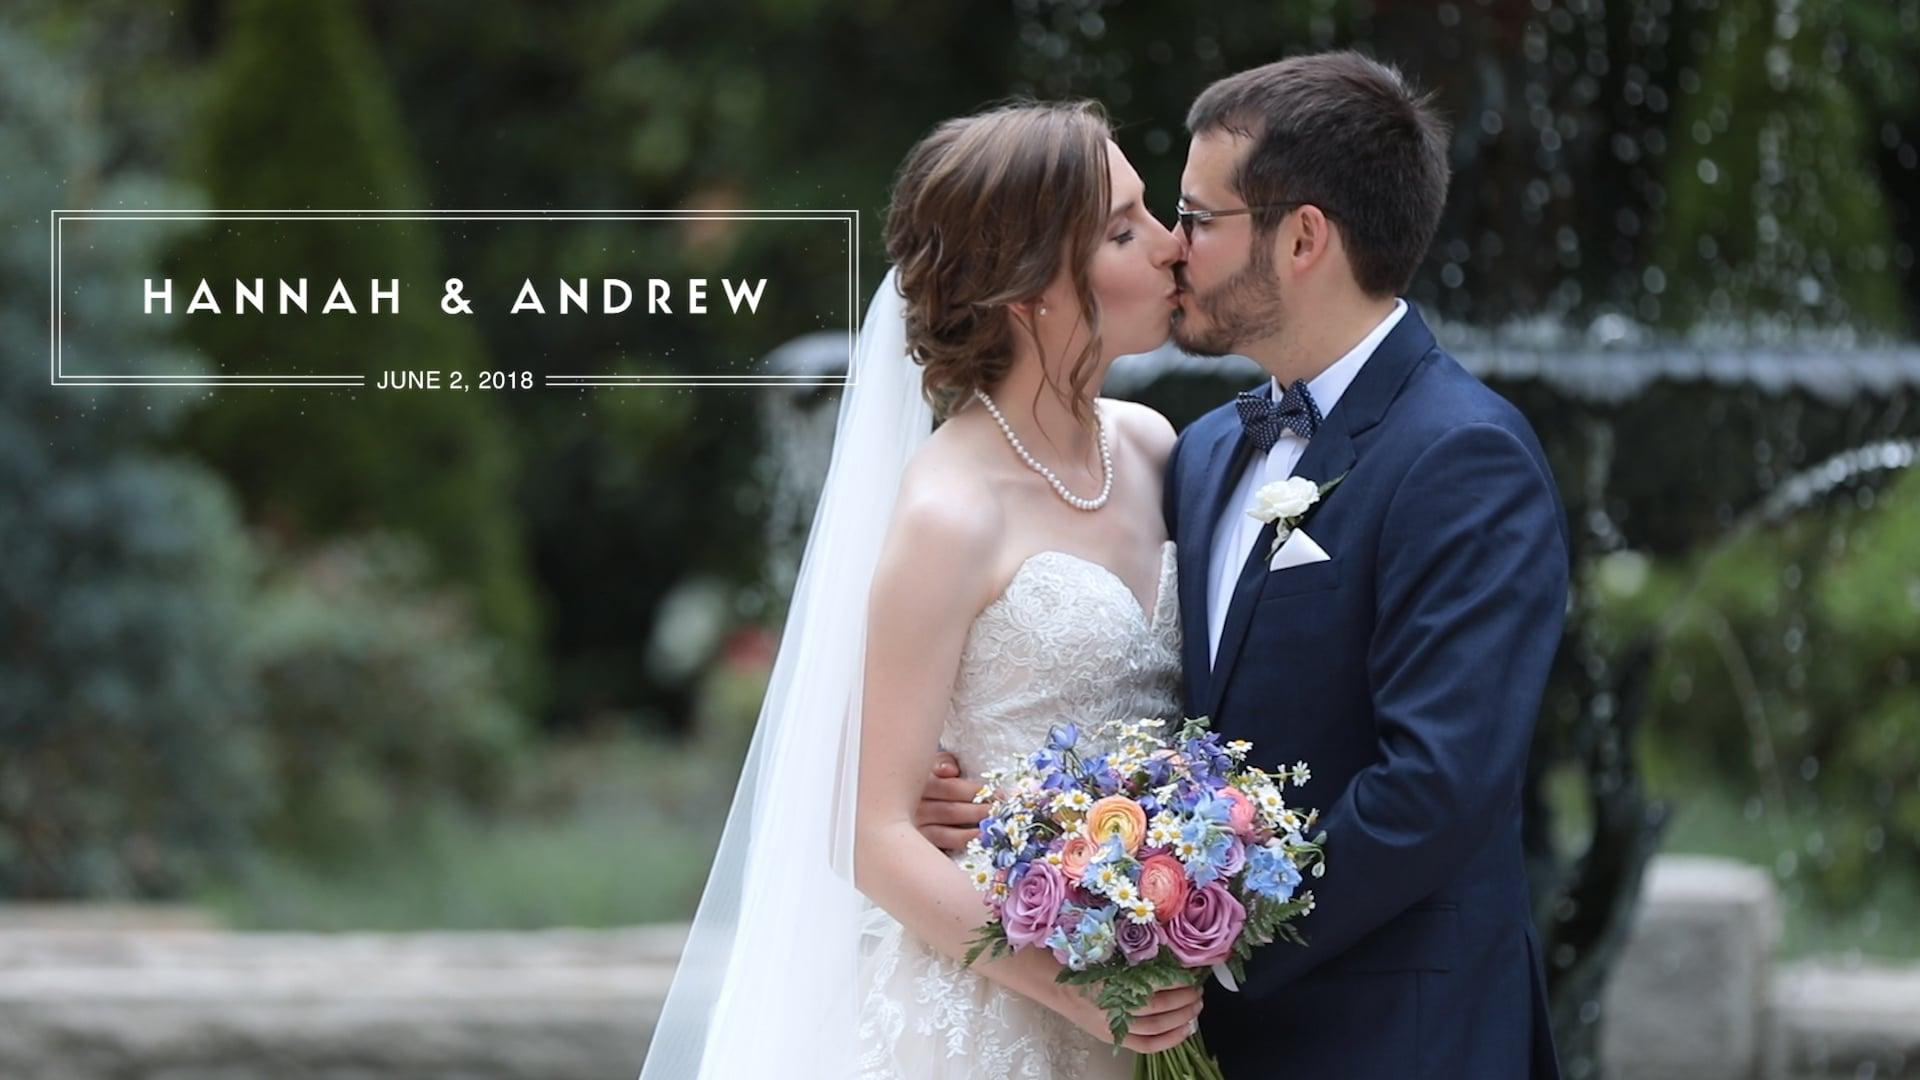 Hannah & Andrew's Wedding Film